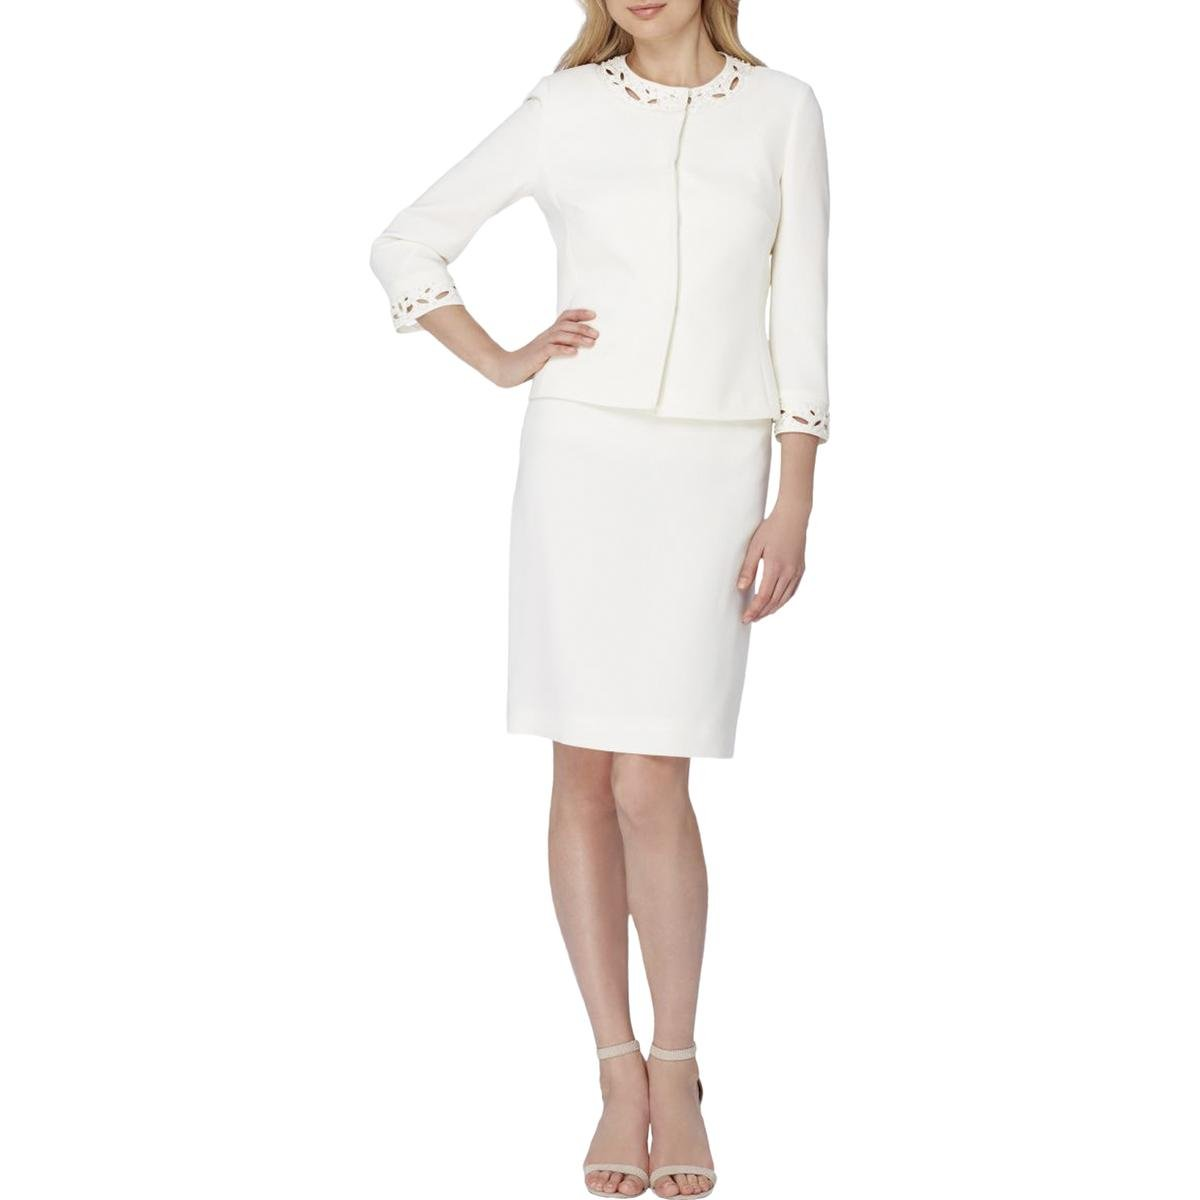 Tahari ASL Womens Plus 2PC Embellished Skirt Suit Ivory 18